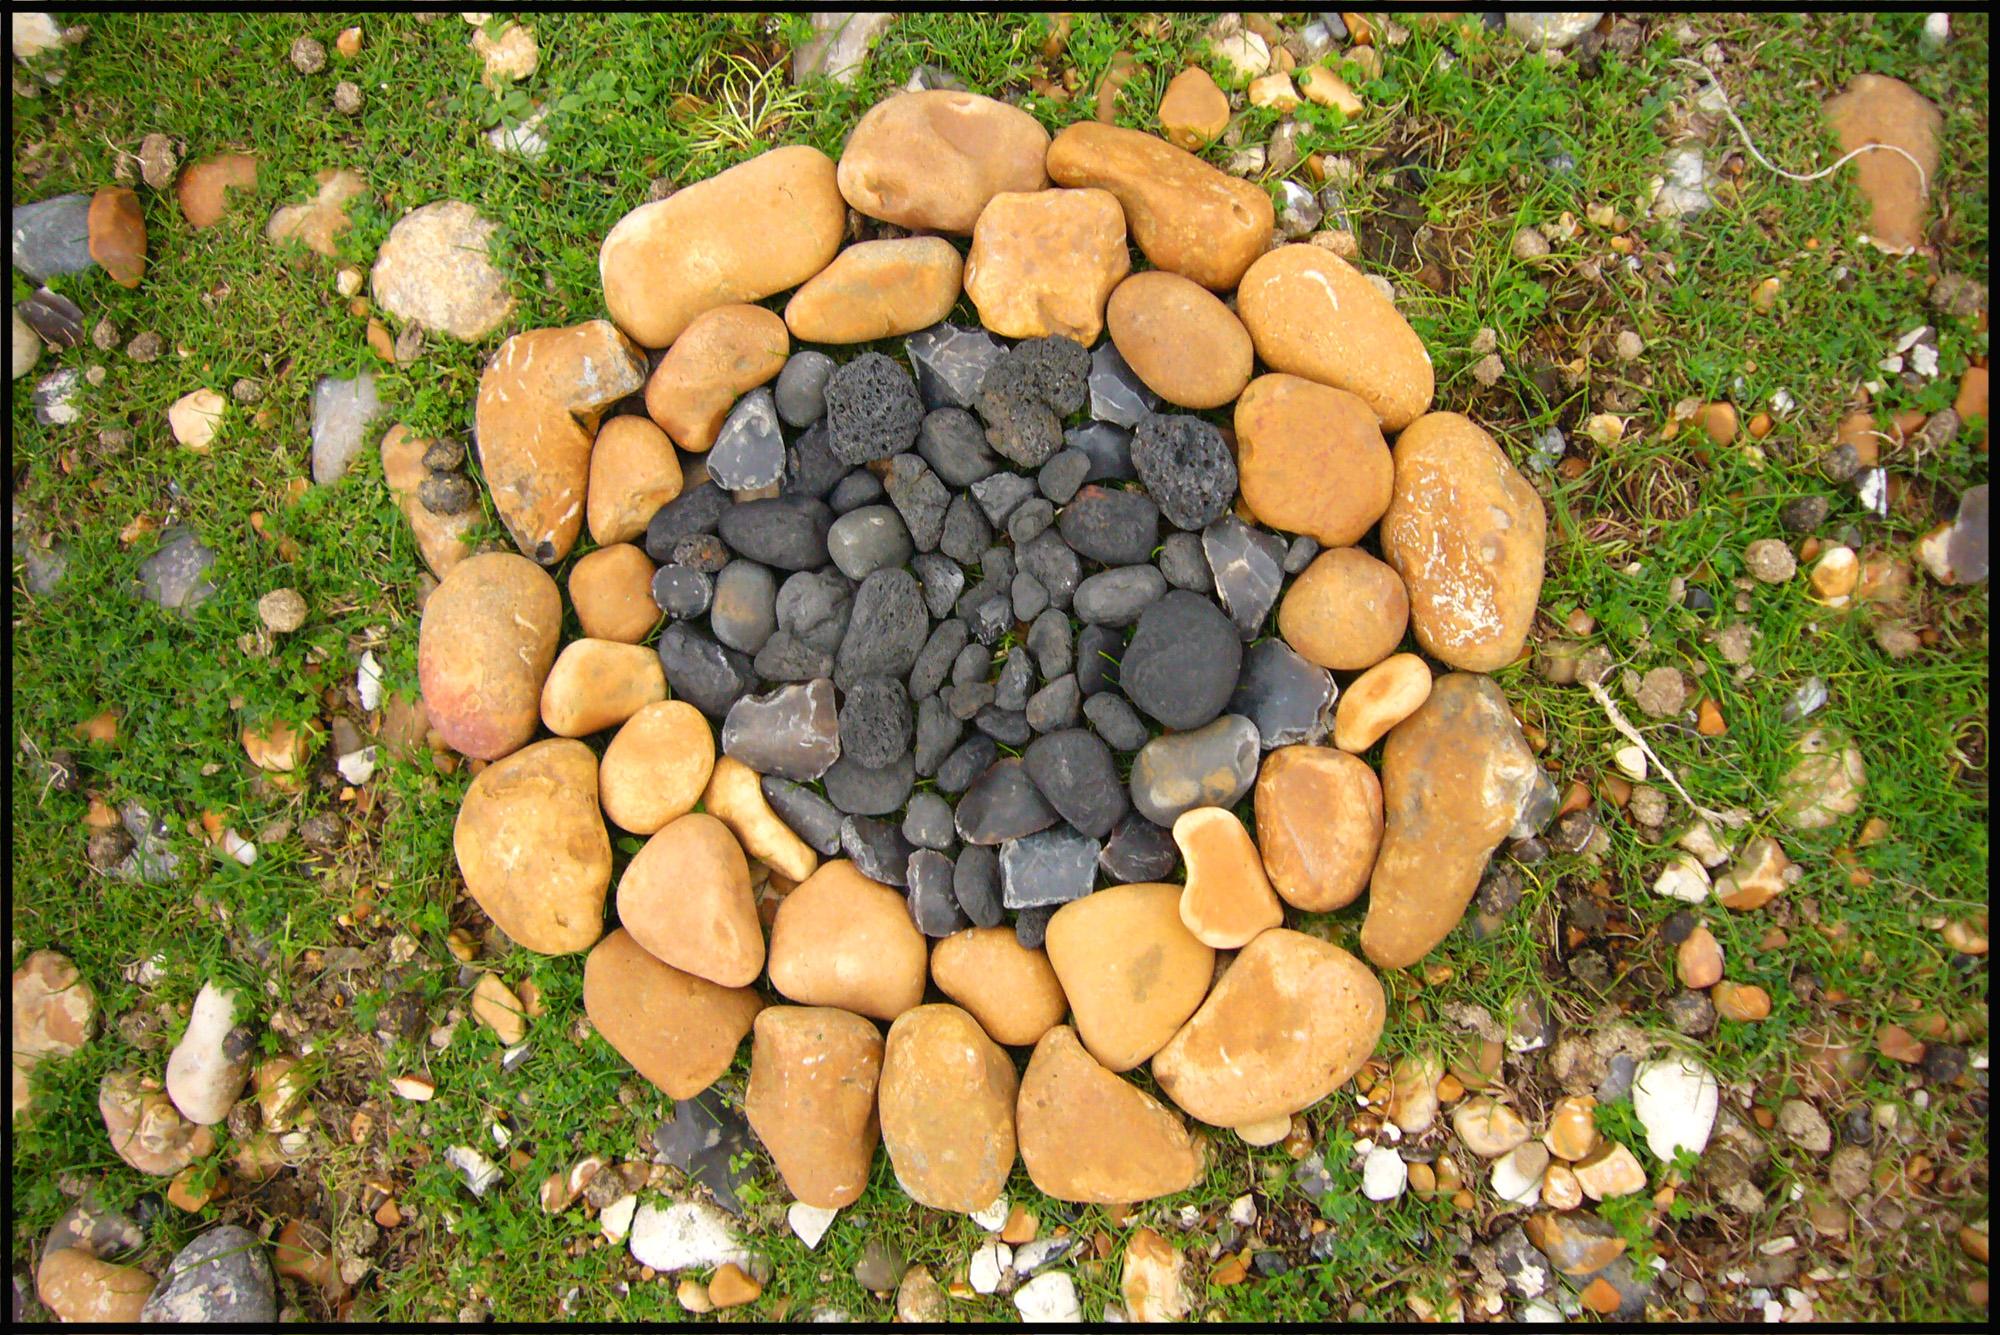 Environmental art lms | Art projects, Environmental art ... |Unusual Environmental Art Project